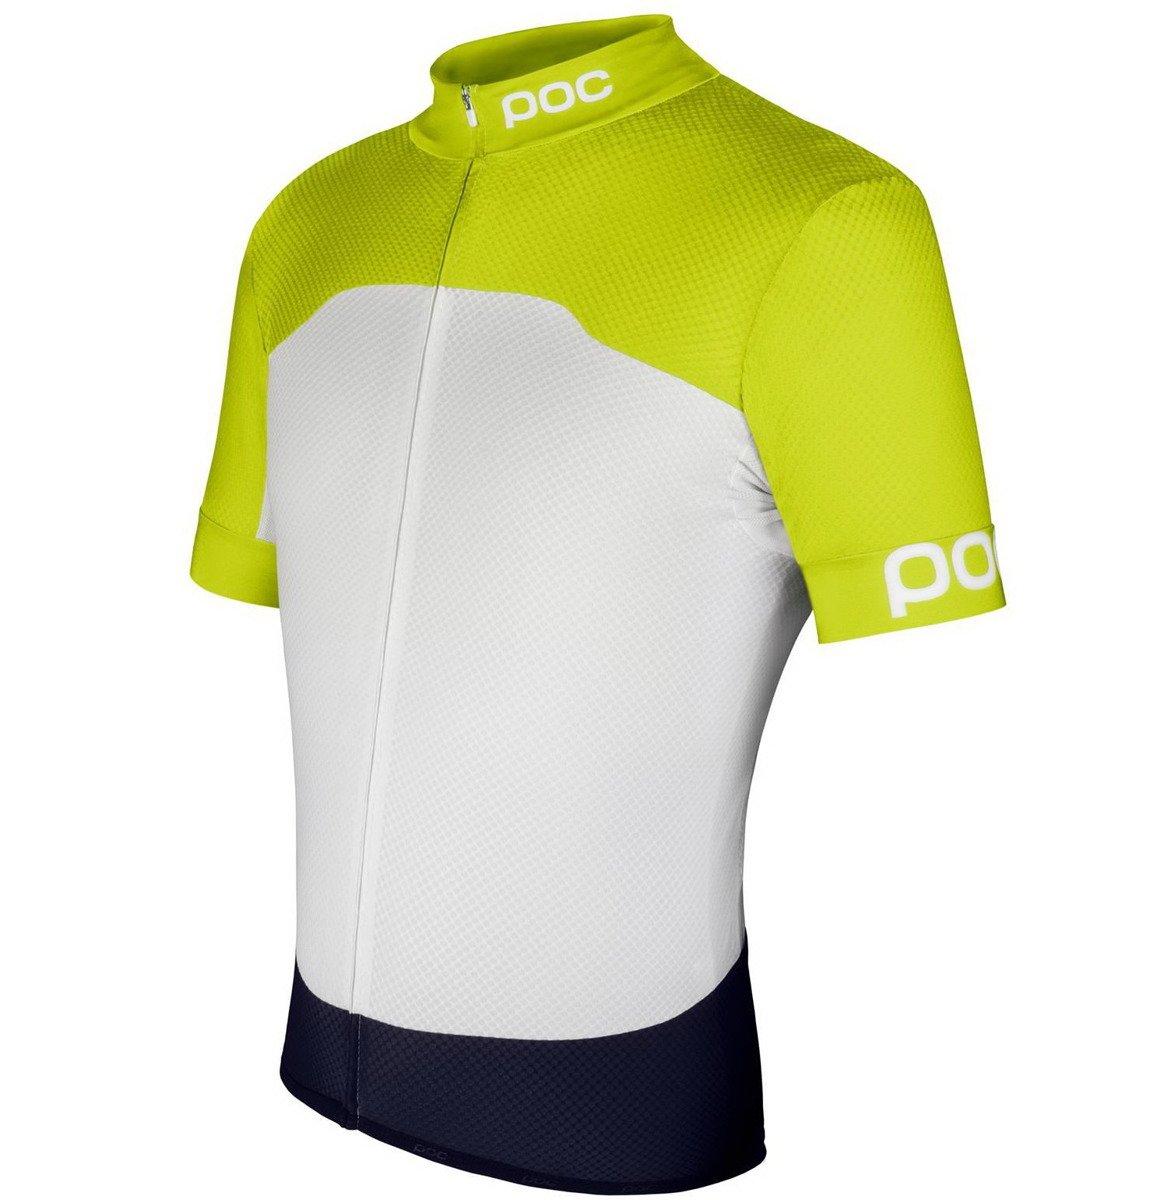 8b31fbacf Koszulka rowerowa POC Raceday Climber Short Sleeve Jersey unobtanium yellow    hydrogen white jersey